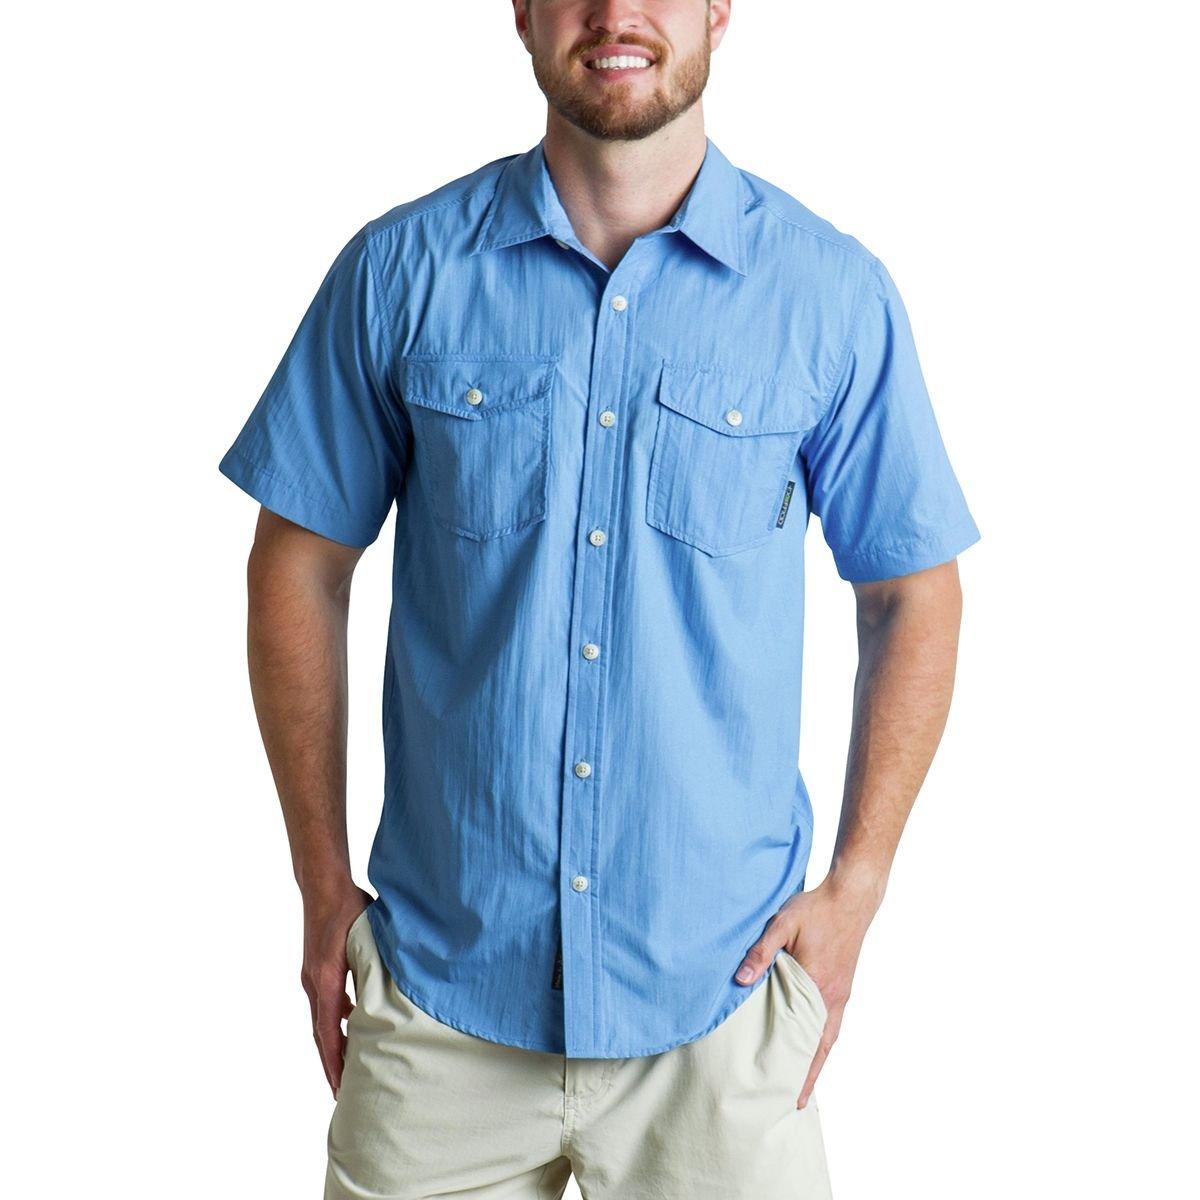 ExOfficio Men's Syros Breathable Short-Sleeve Shirt, Silverlake, Small